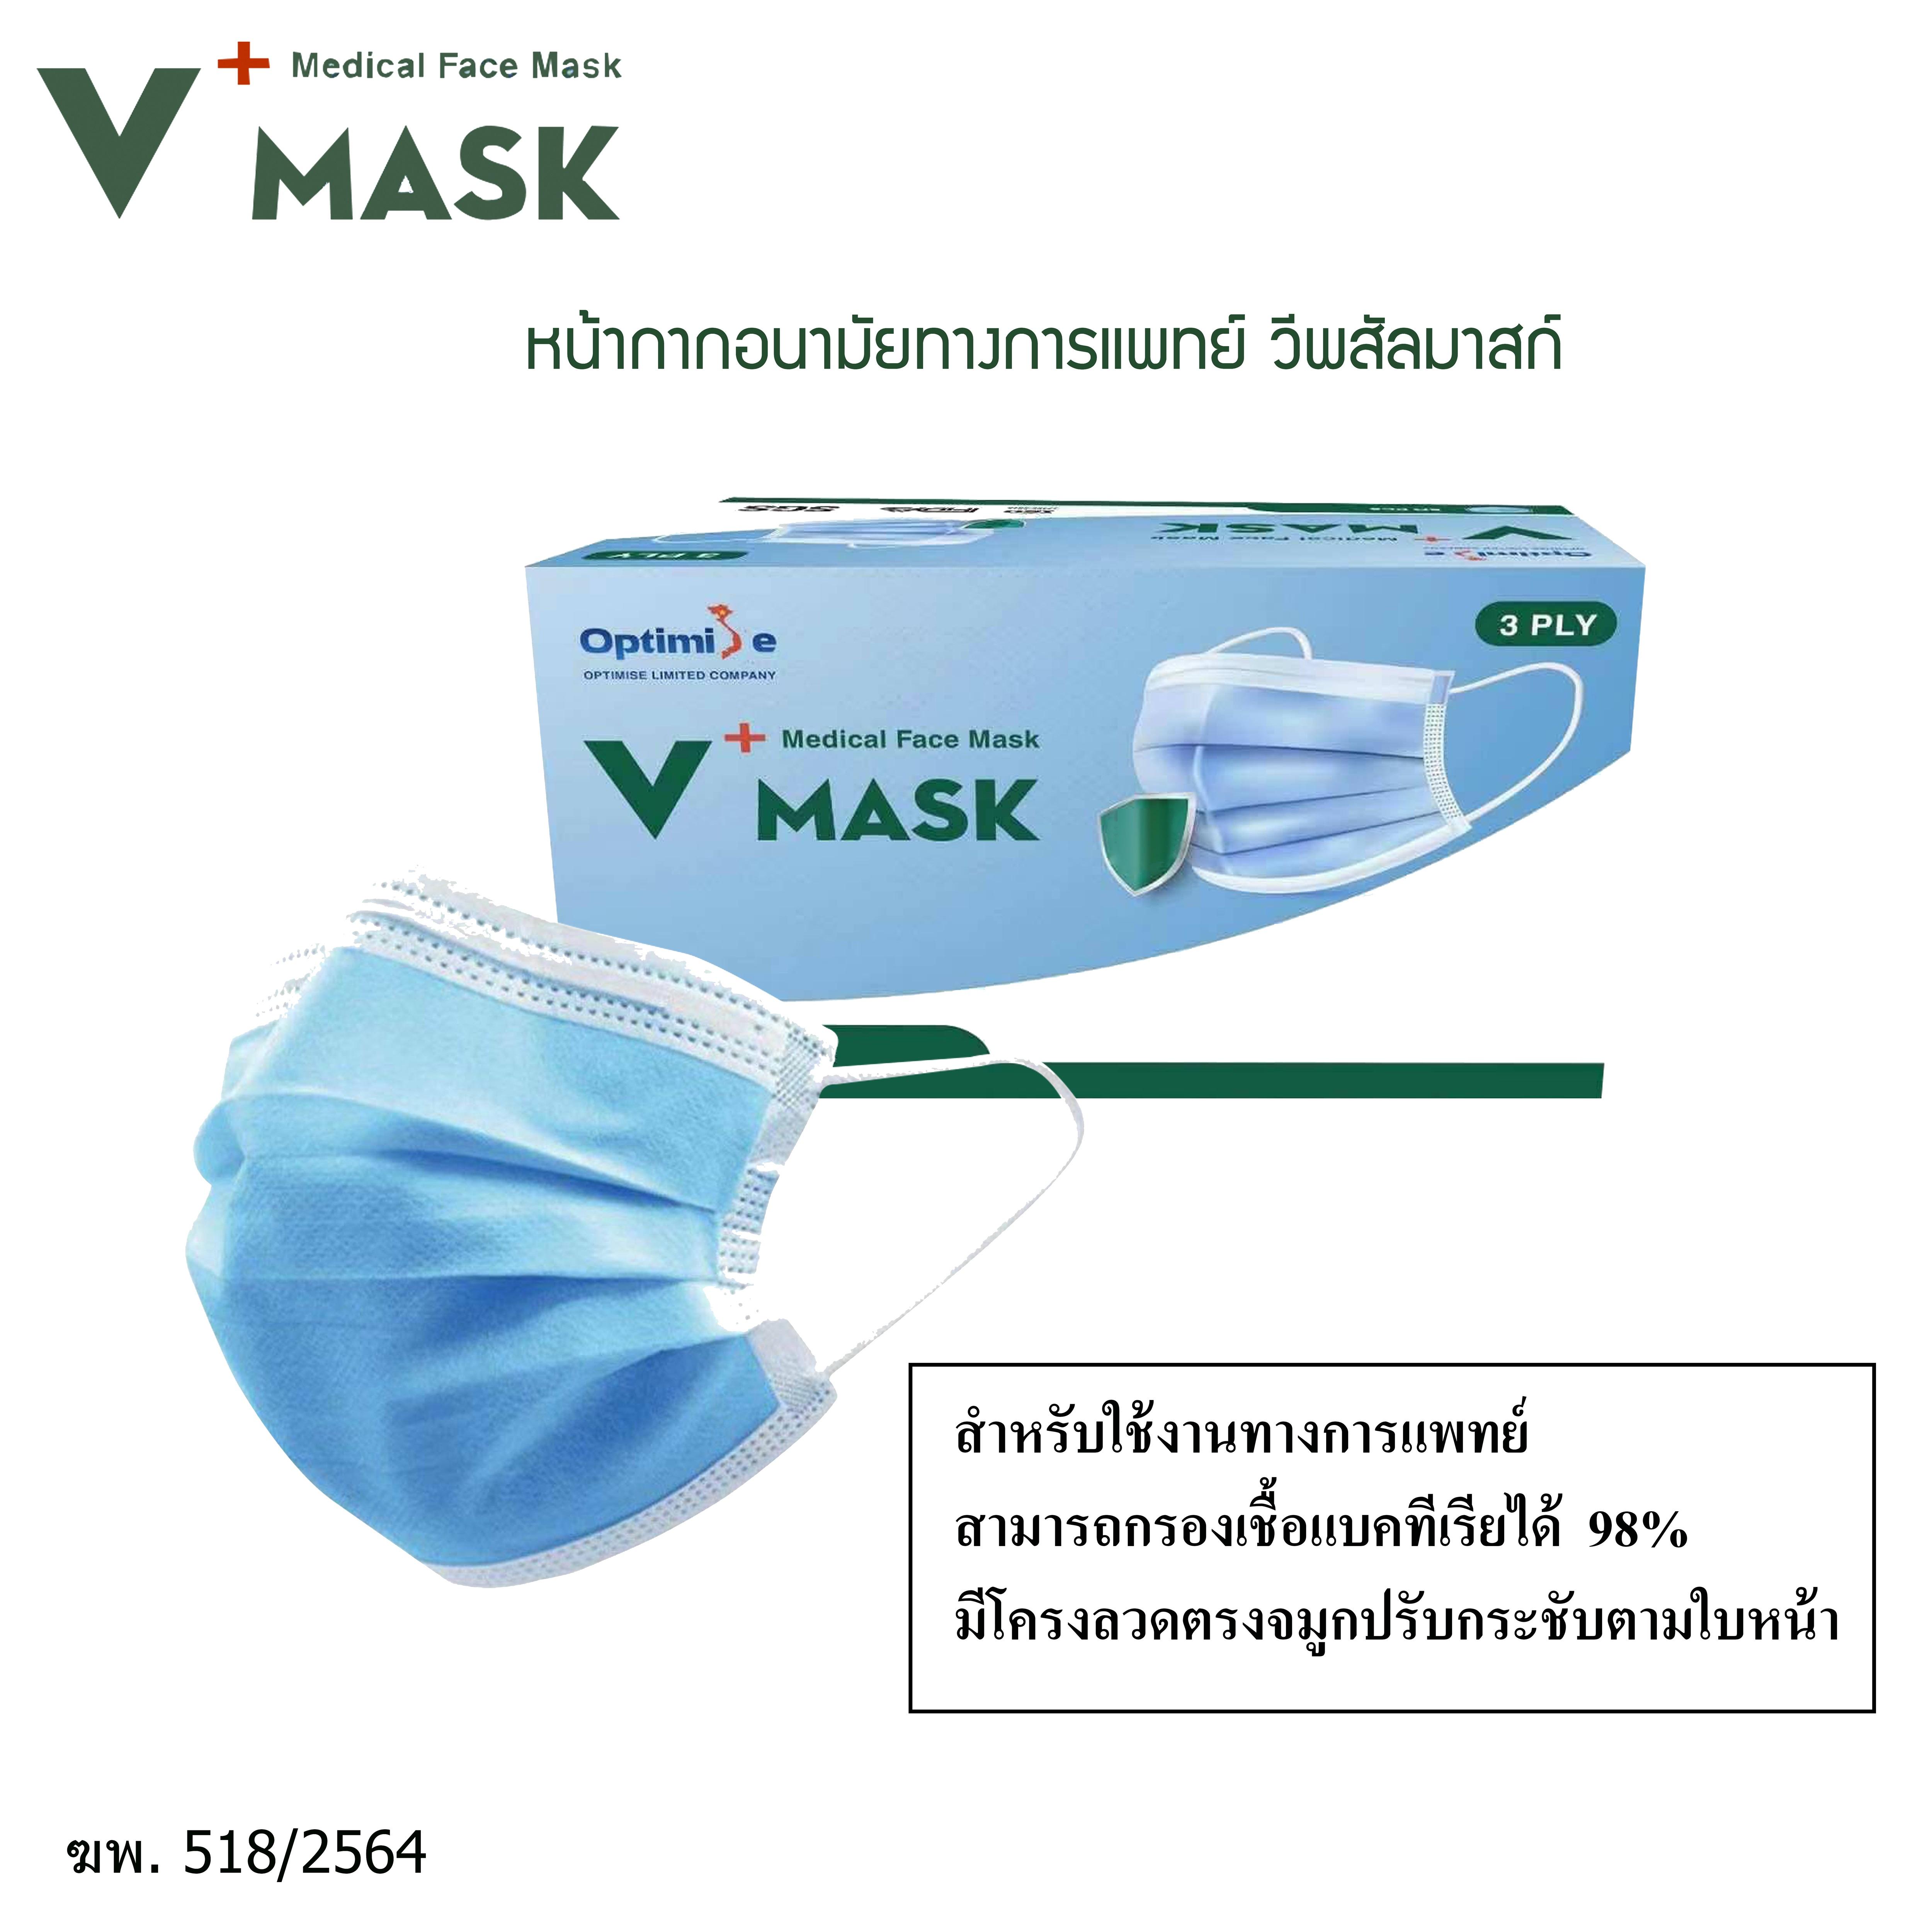 V+ MASK หน้ากากอนามัยทางการแพทย์  วีพลัสมาสก์   หน้ากากอนามัย  หน้ากาก  แมสก์